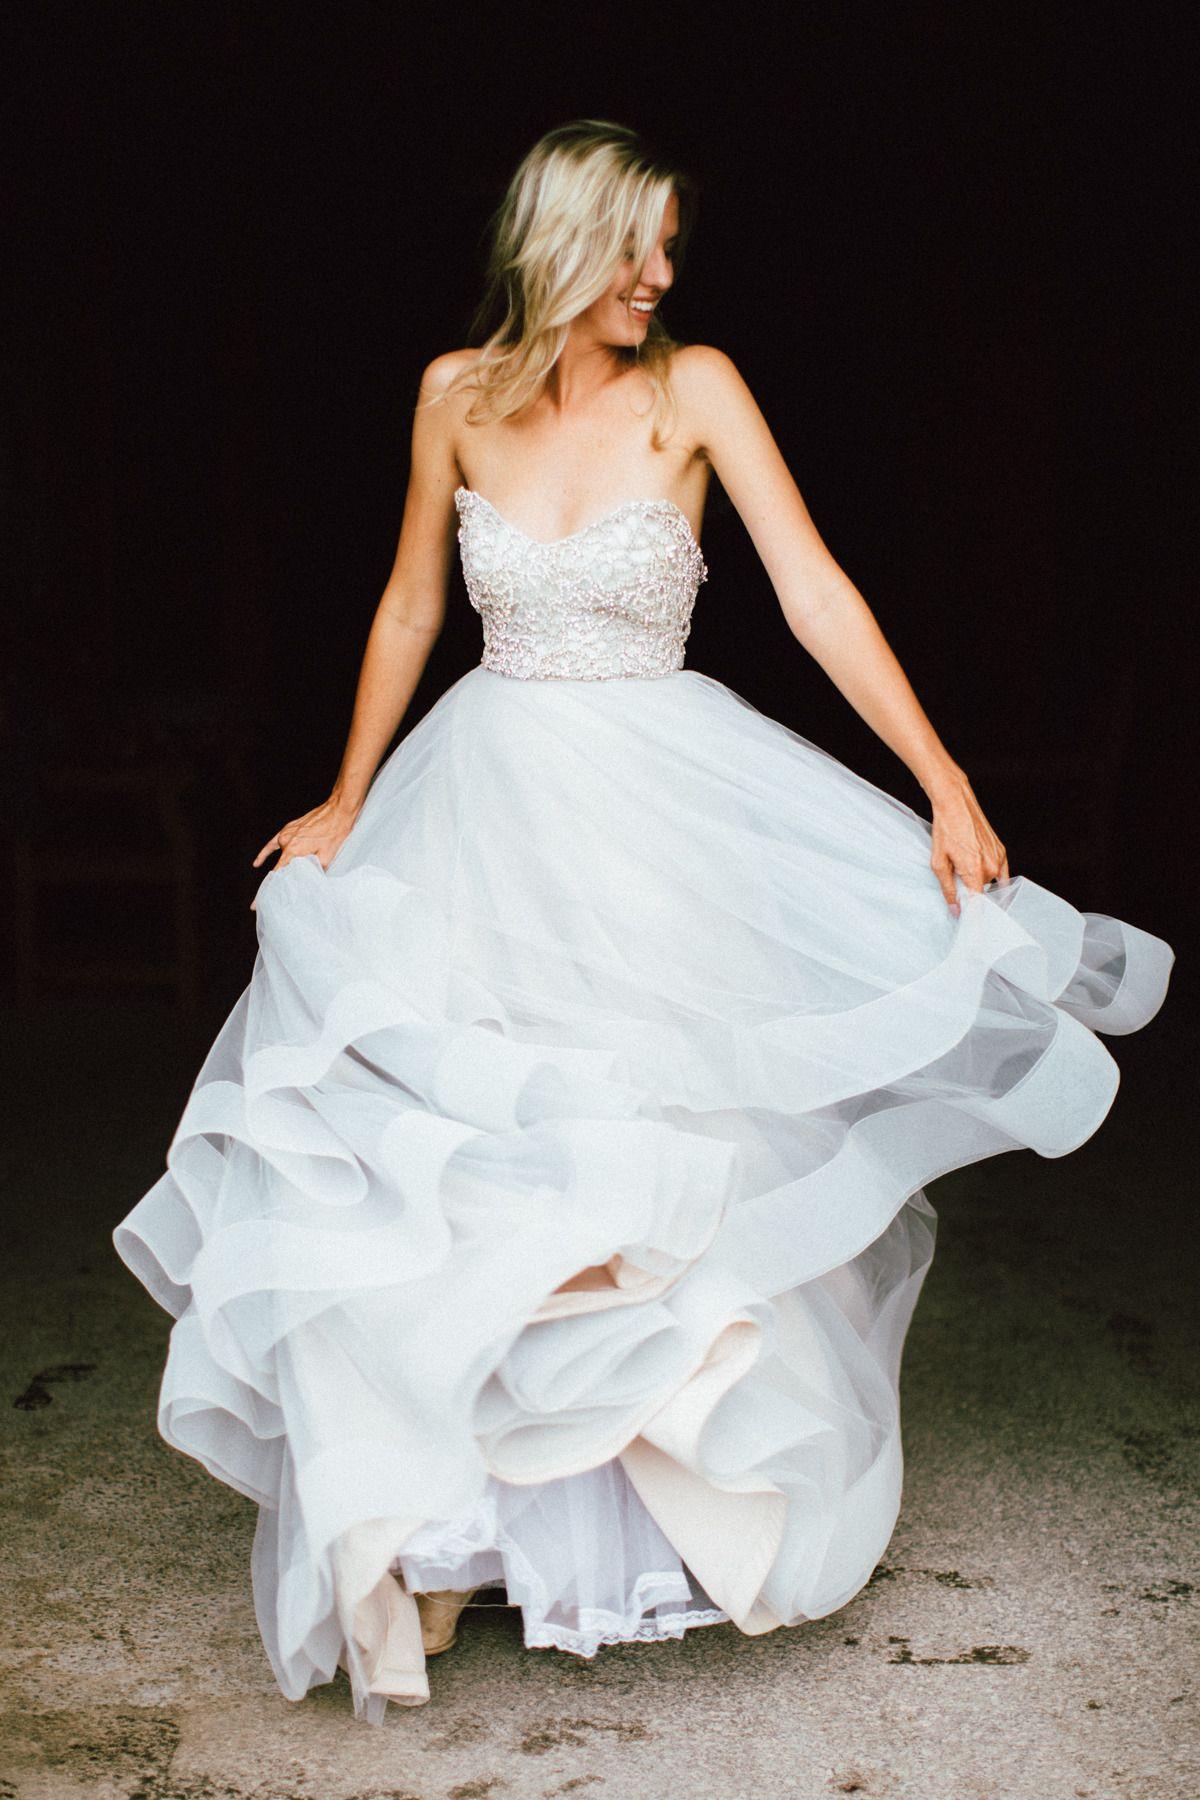 Rustic Elegant Country Wedding Inspiration Moms